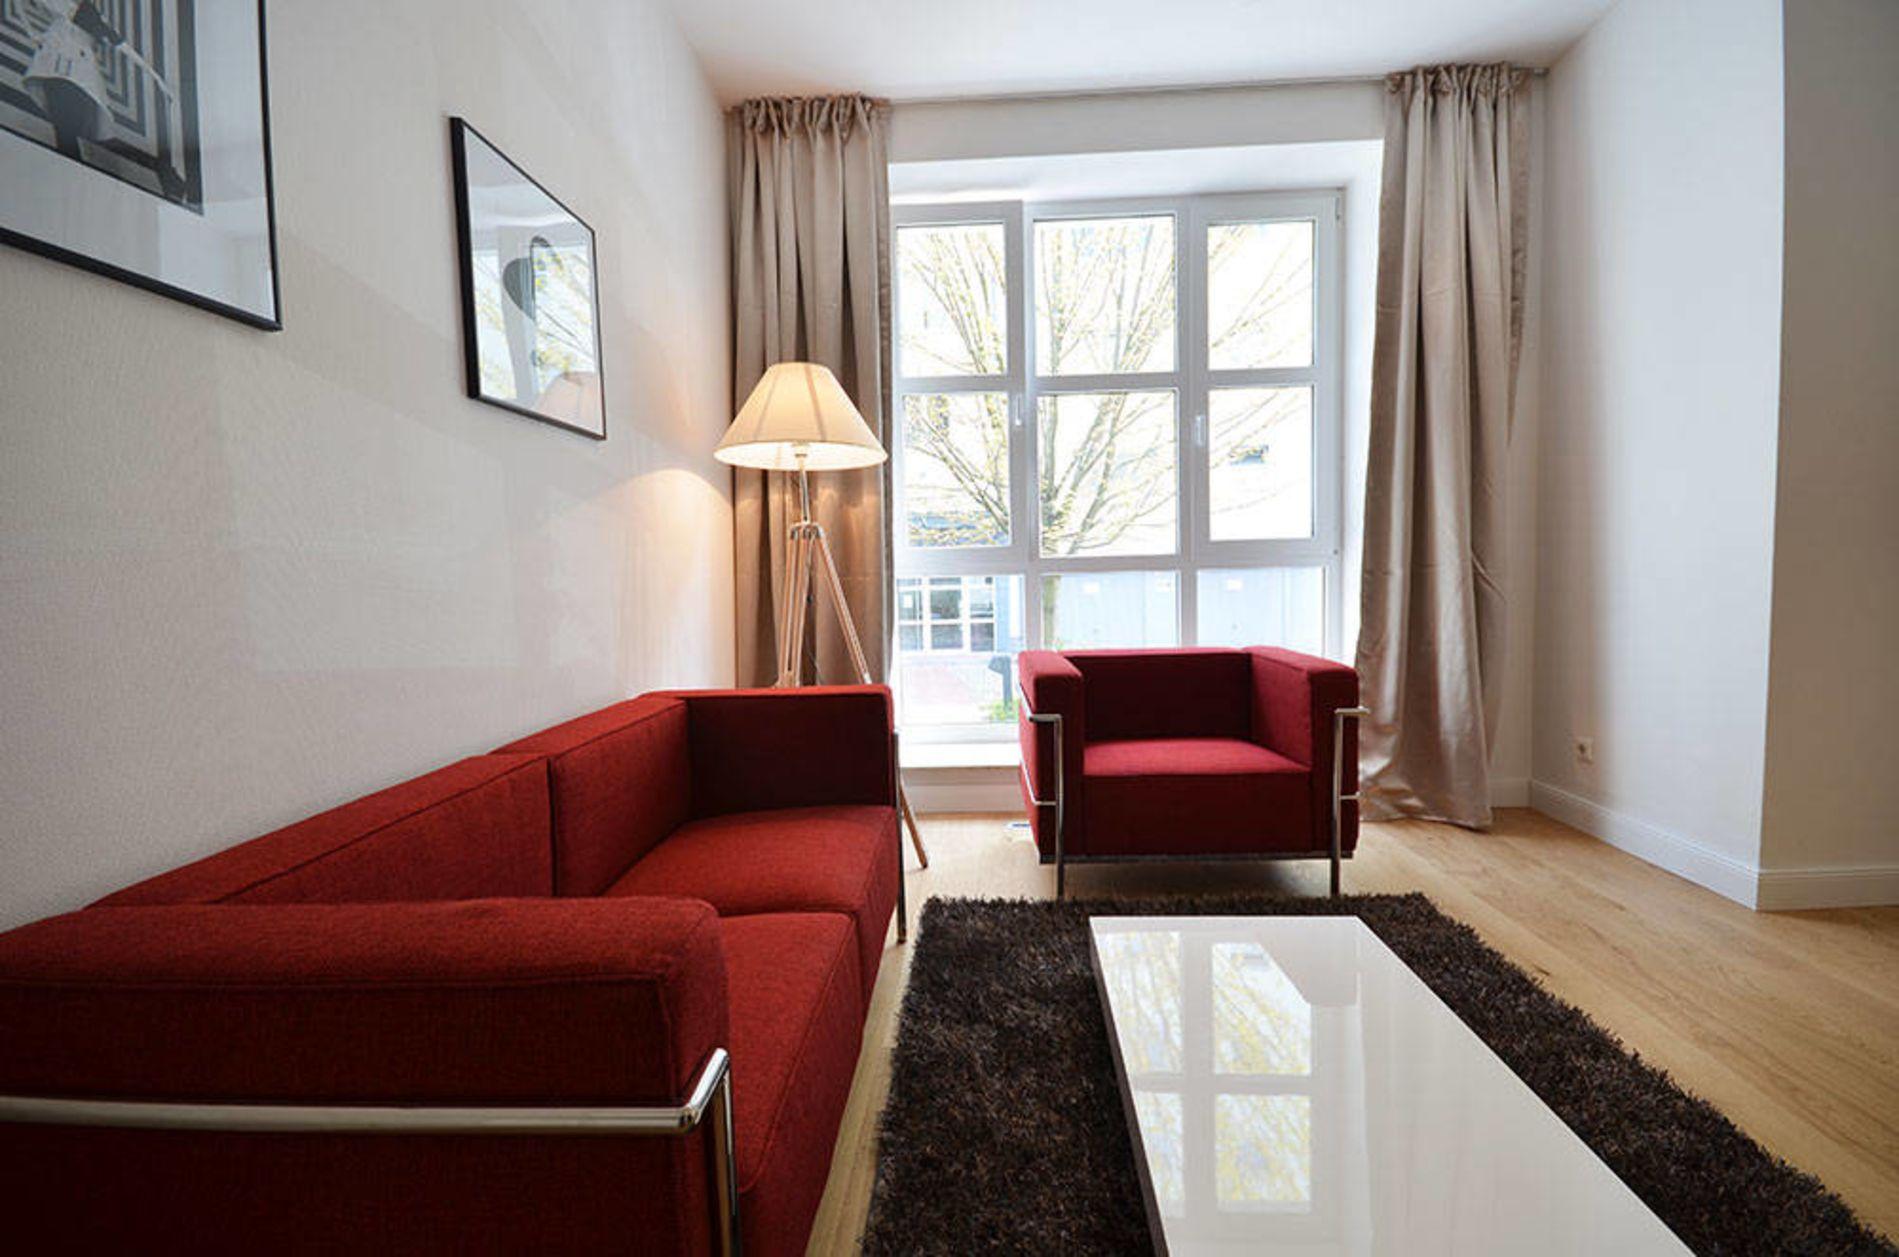 Instant bookable premium 1 bedroom serviced accommodation in Frankfurt Green Belt